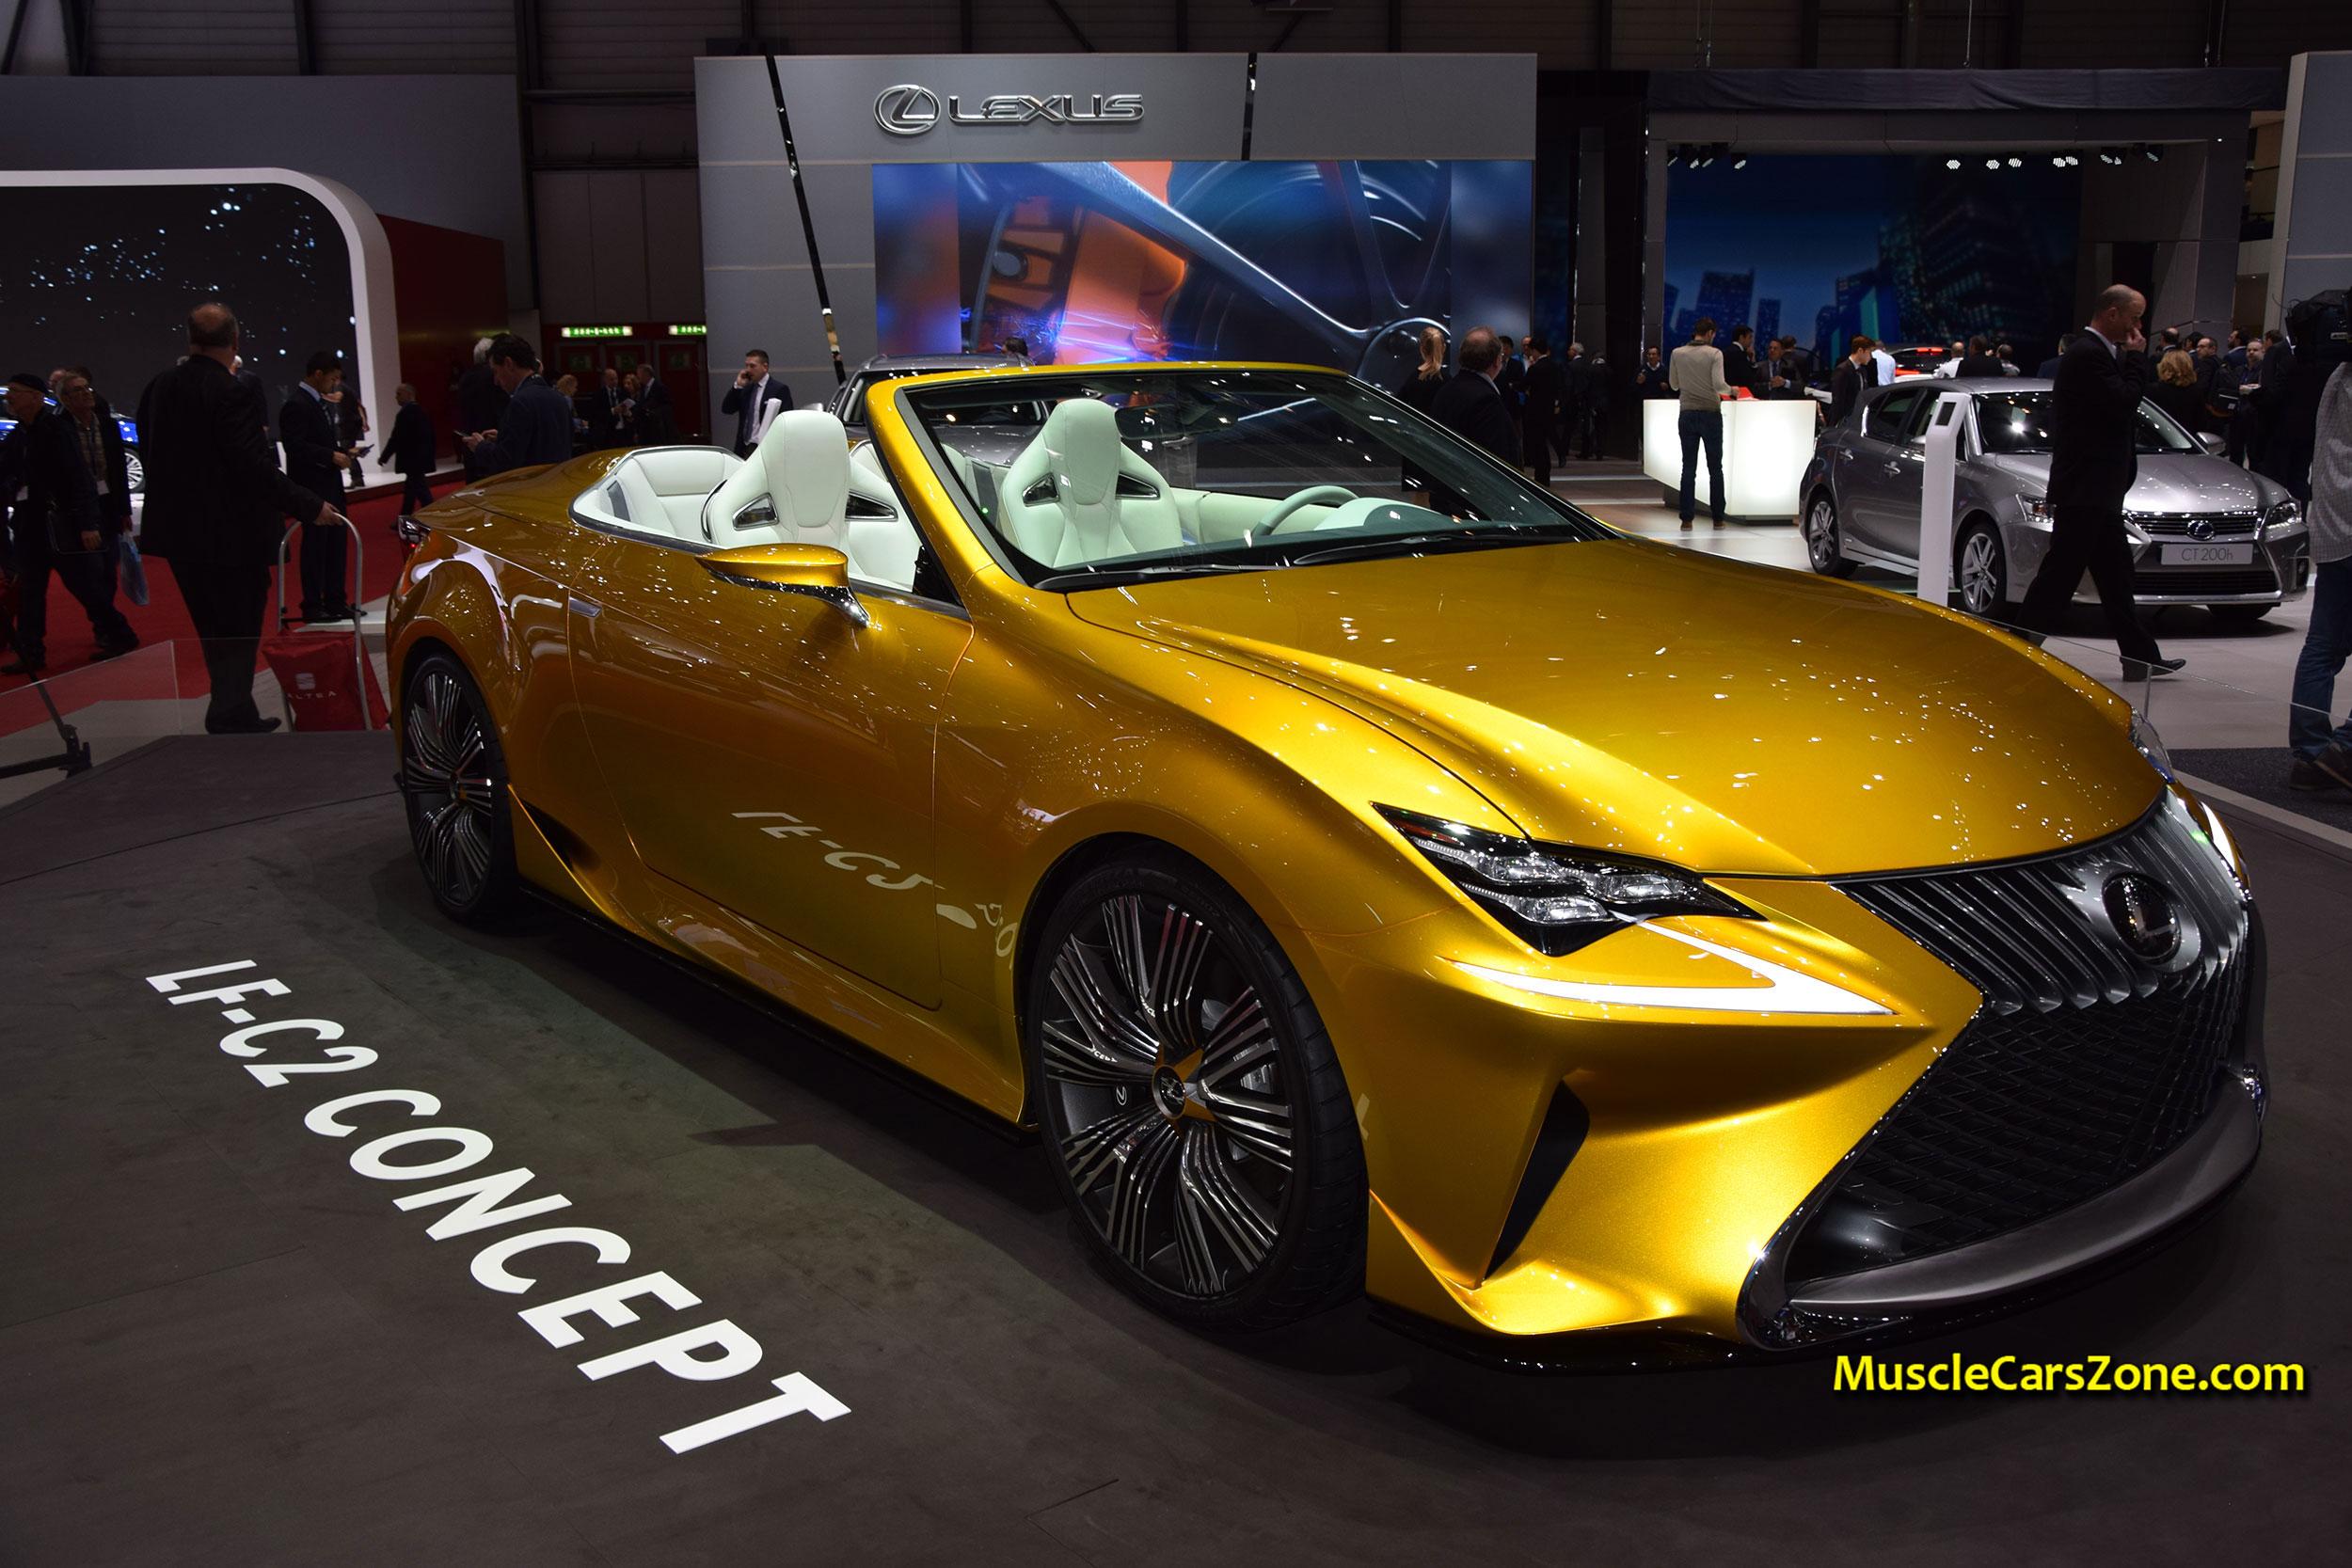 http://www.musclecarszone.com/wp-content/uploads/2015/03/2015-Lexus-LF-C2-Concept-03-2015-Geneva-Motor-Show-.jpg